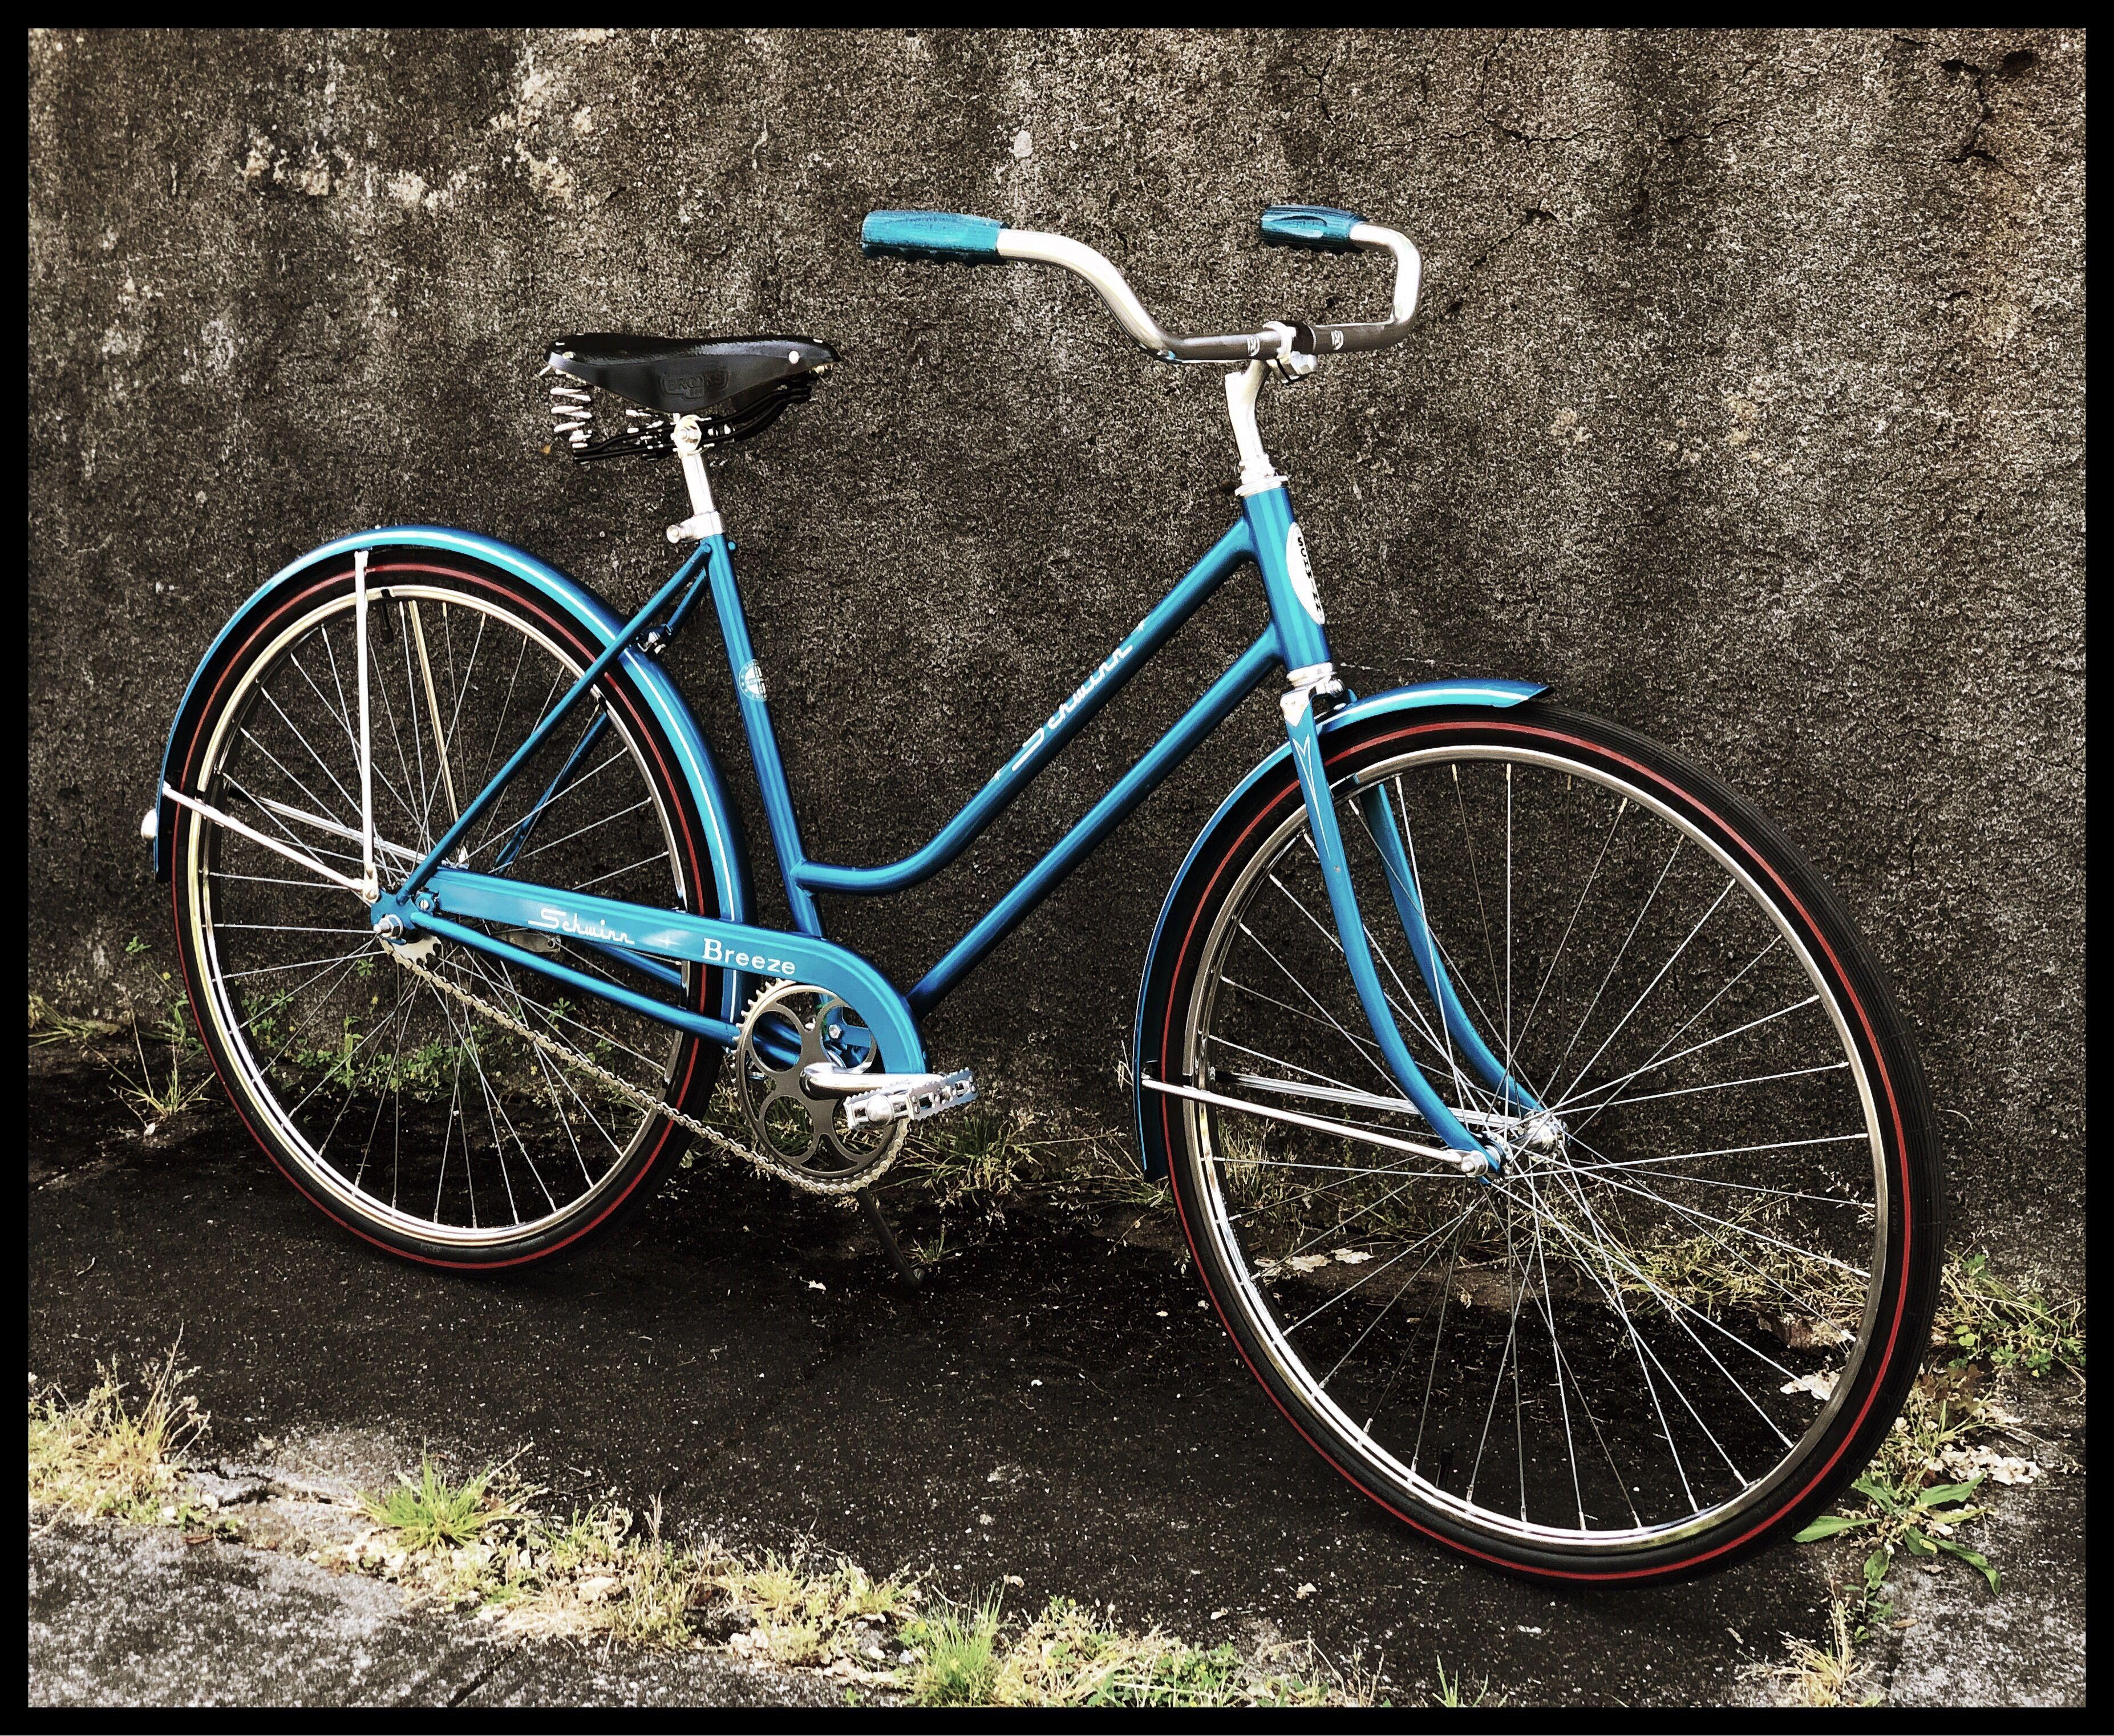 1967 Schwinn Breeze Bicicletas, Deportes